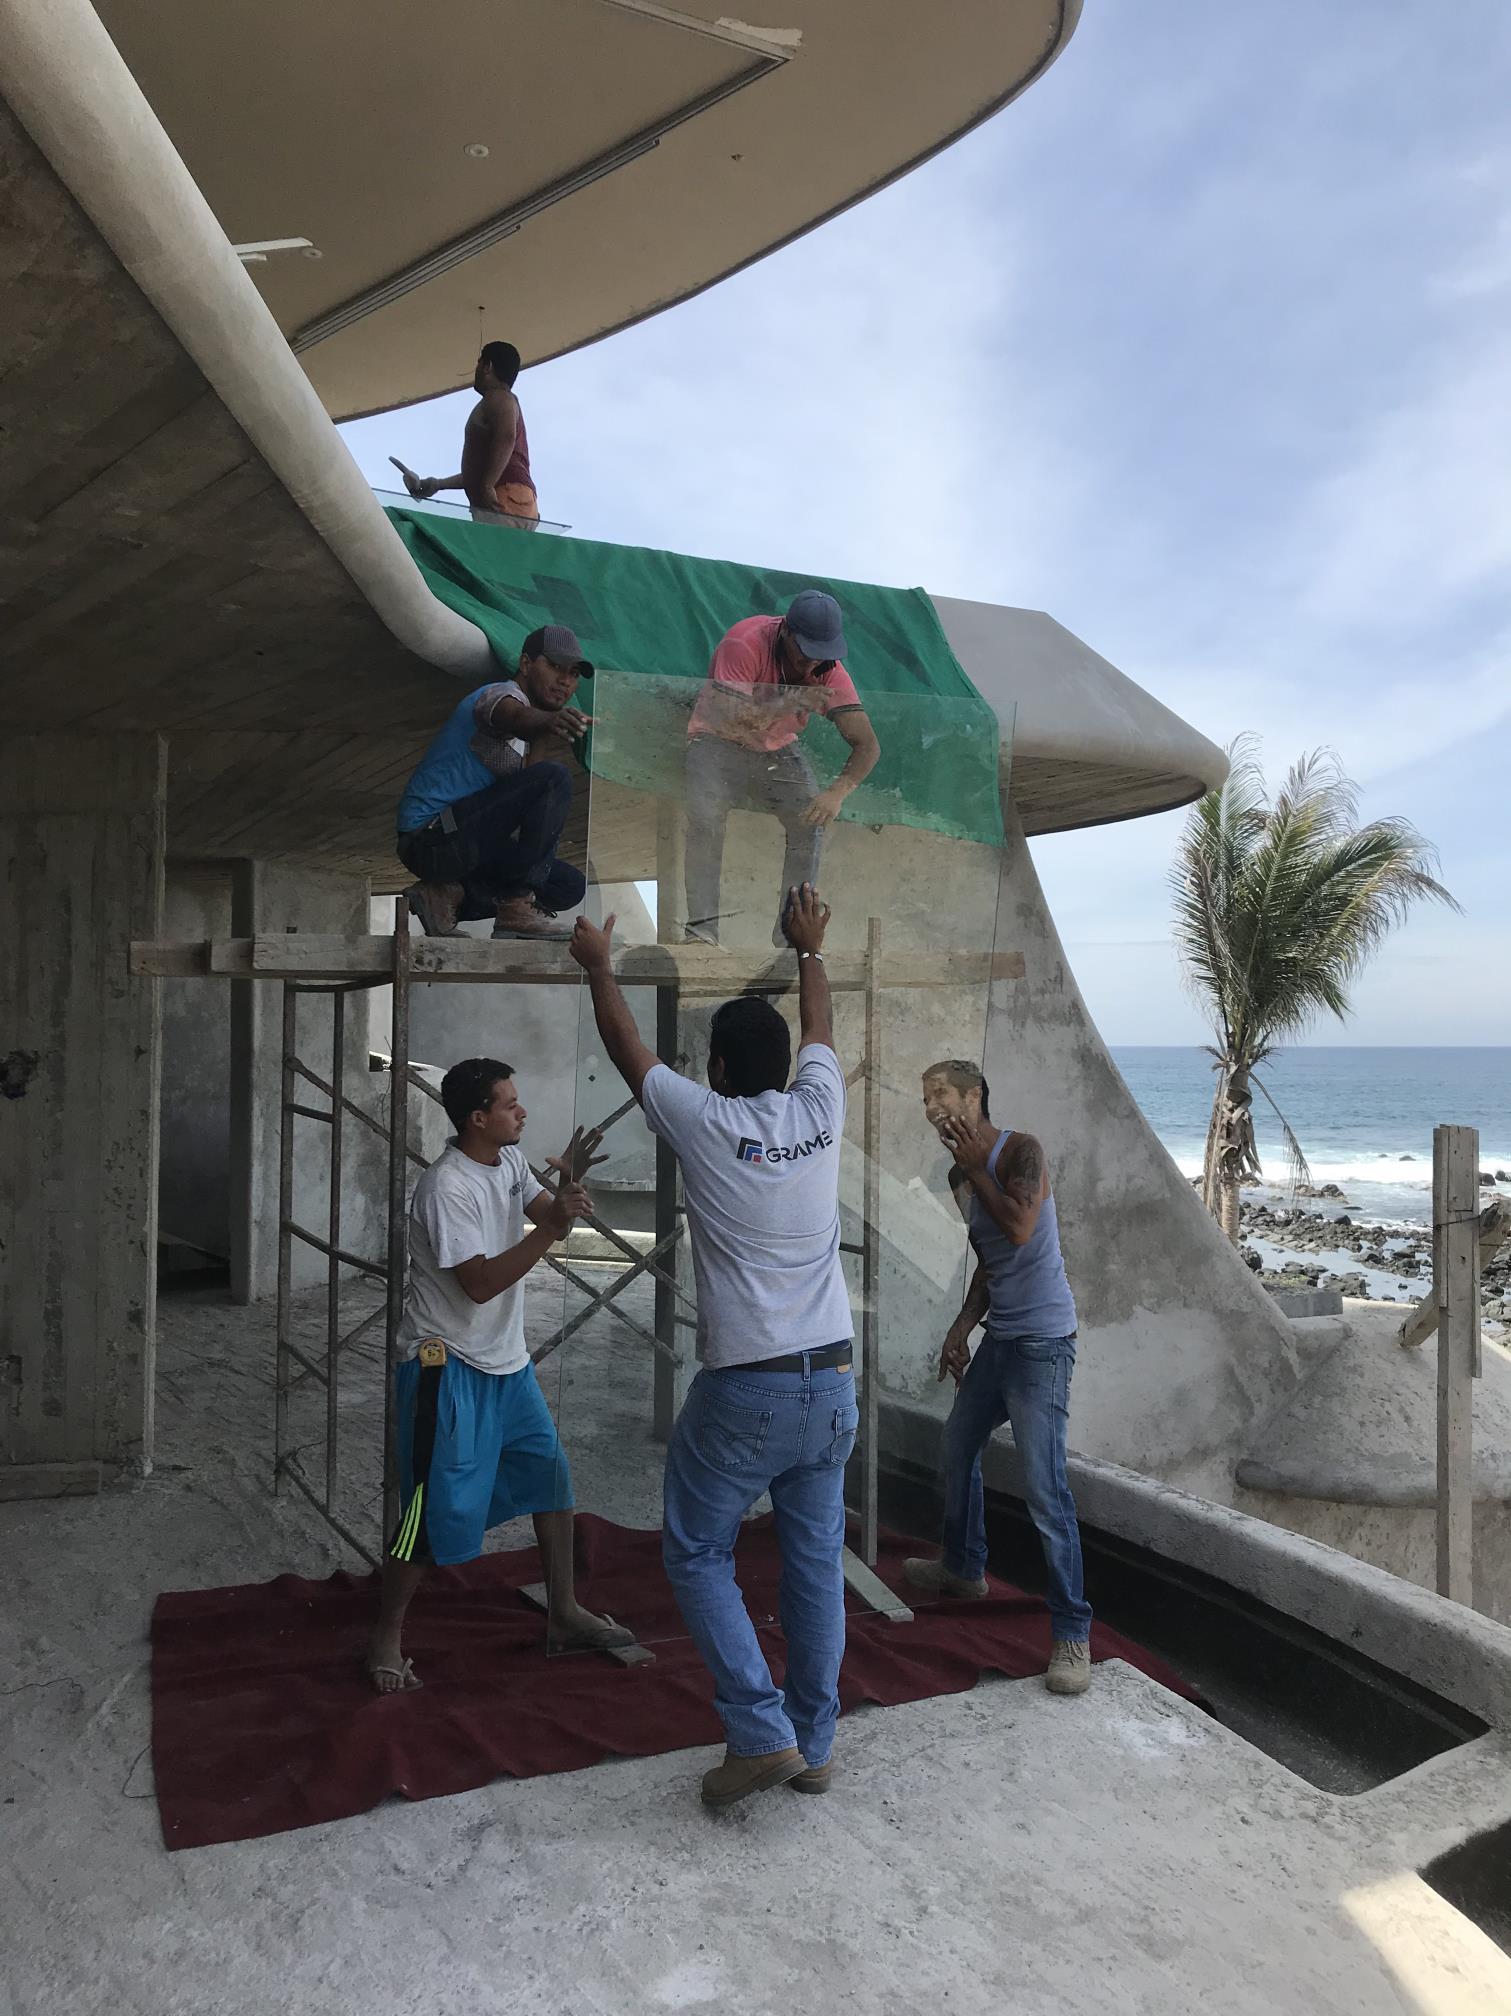 REPORTE-FOTOGRAFICO-PUNTA-MAJAHUA-04-DE-FEBRERO-DEL-2018-014.jpg